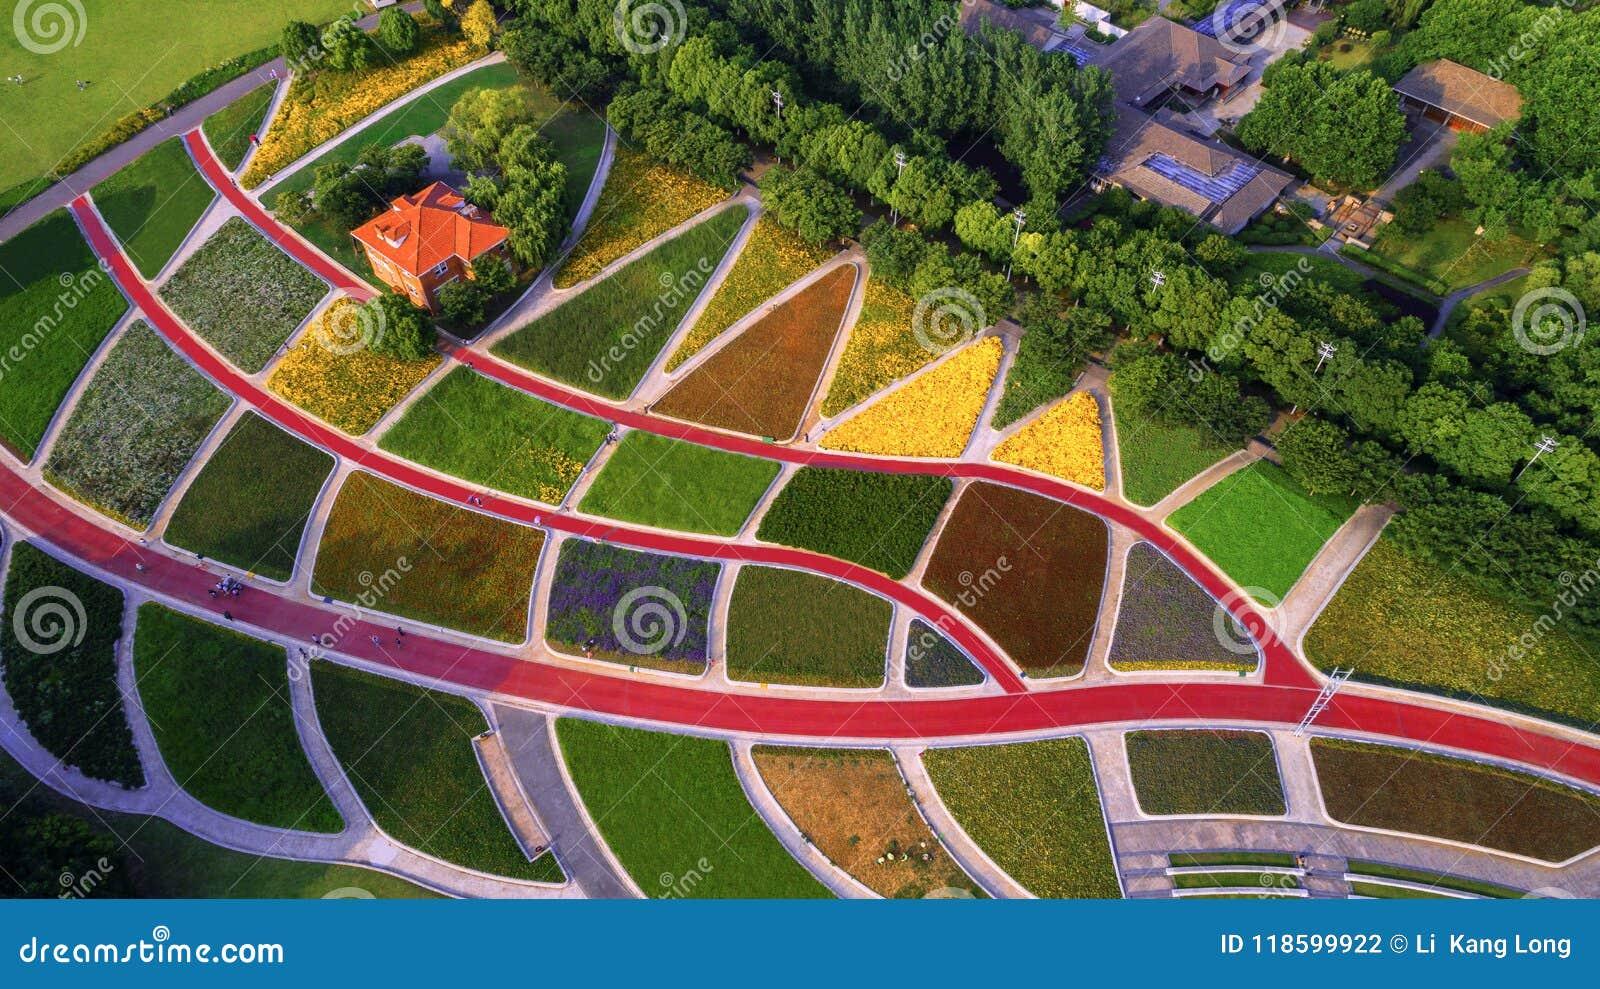 Fotografia aérea - pastoral rústico